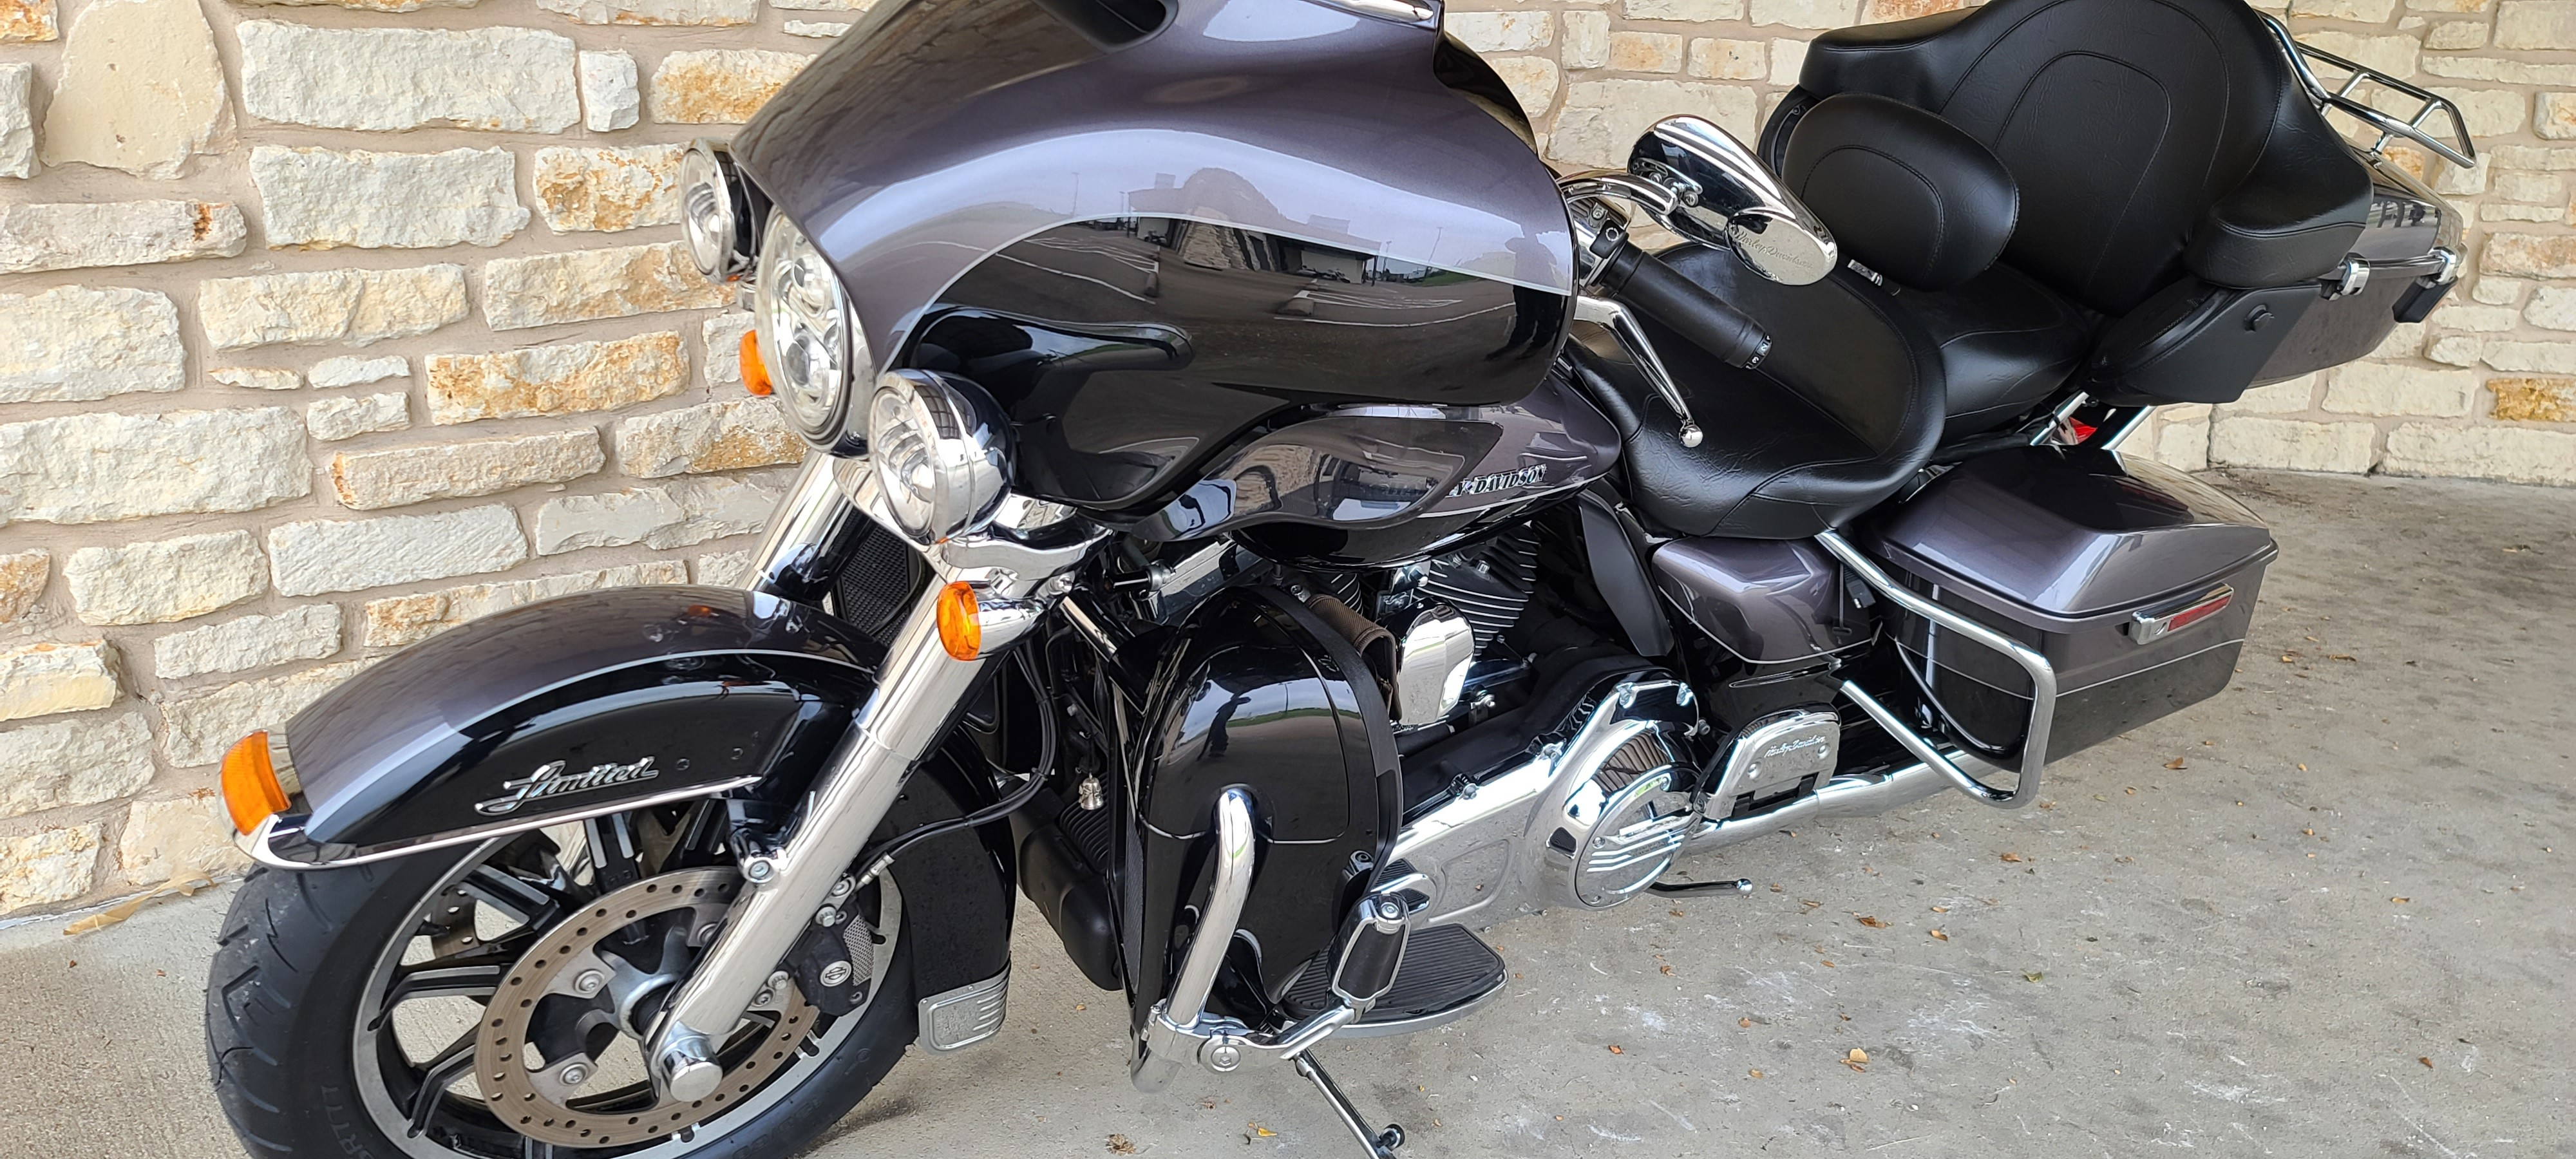 2014 Harley-Davidson Electra Glide Ultra Limited at Harley-Davidson of Waco